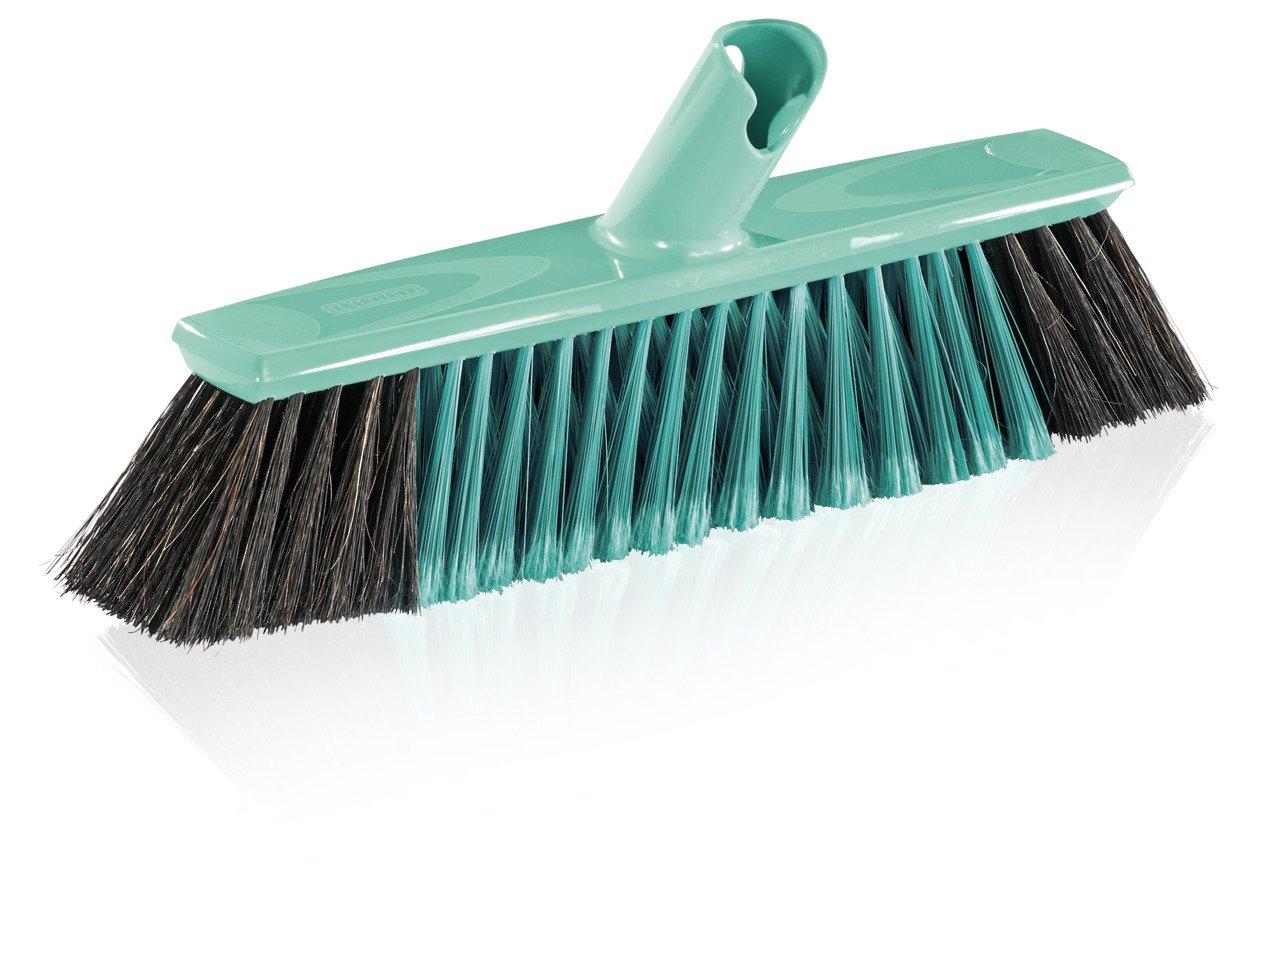 Leifheit Allround Broom Xtra Clean 40 cm, Natural Hair, House Brush, Dustpan Brush, Mint Green, 45031